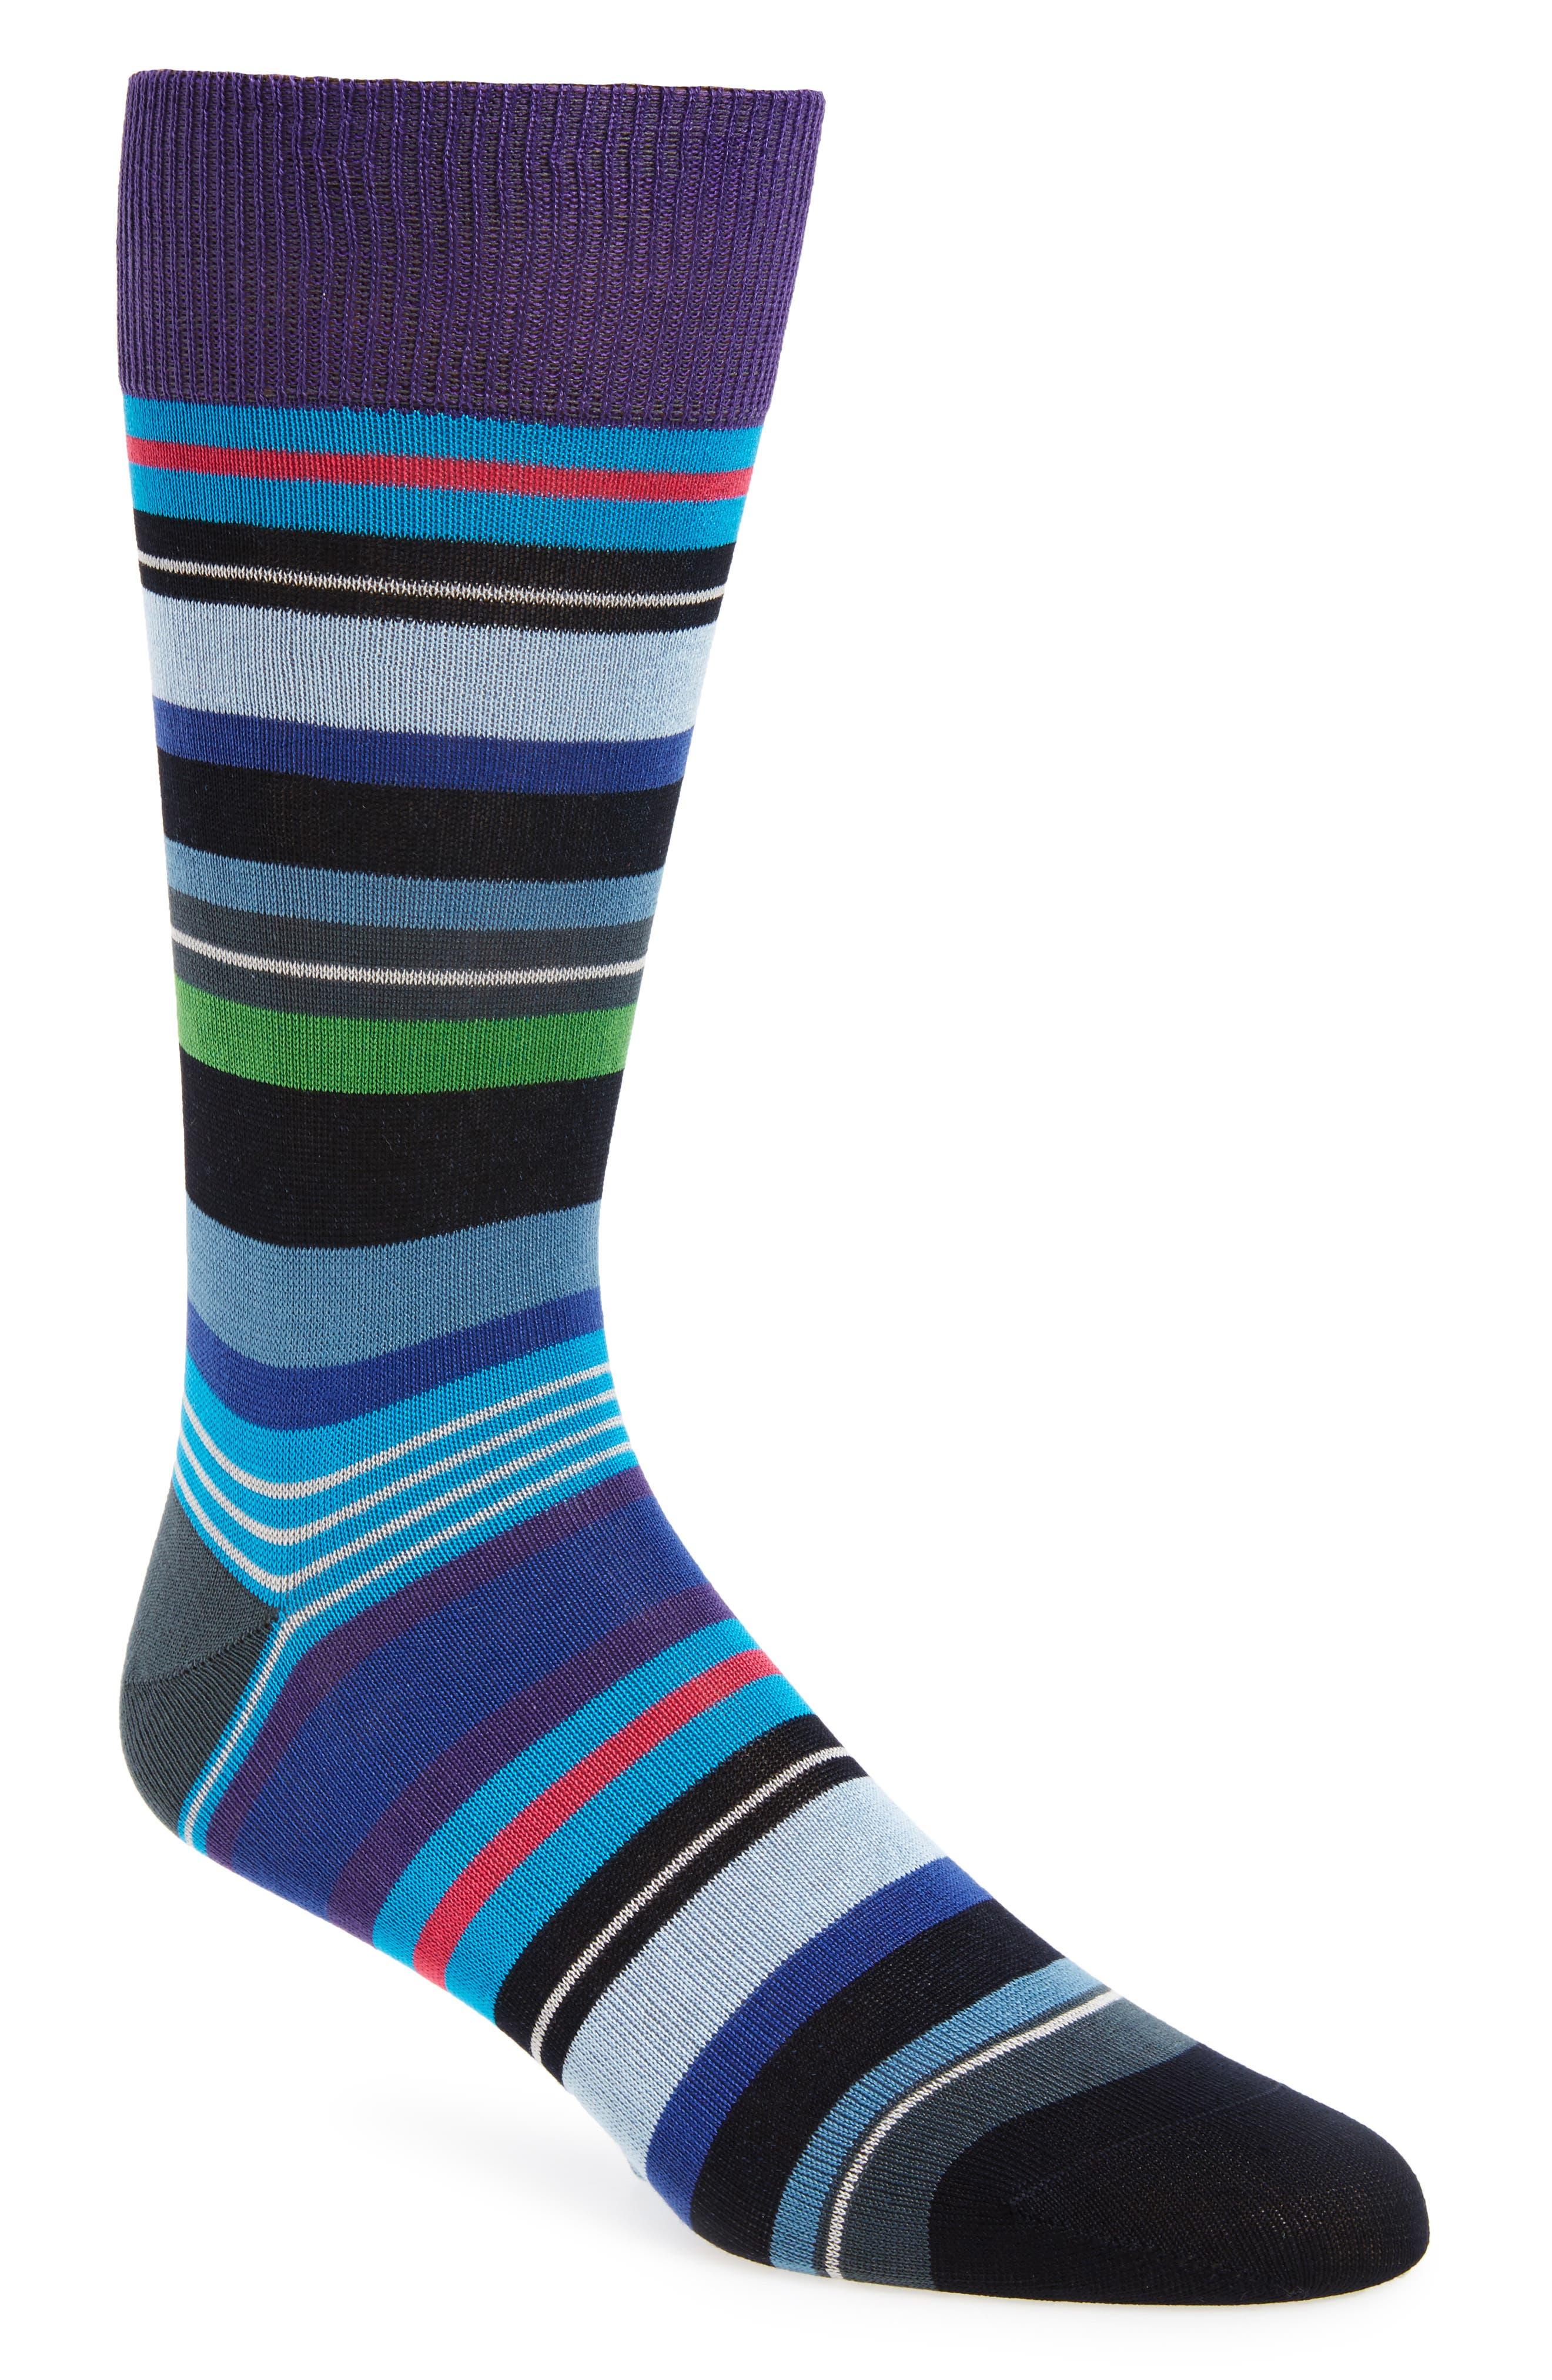 Main Image - Paul Smith Halentoe Stripe Socks